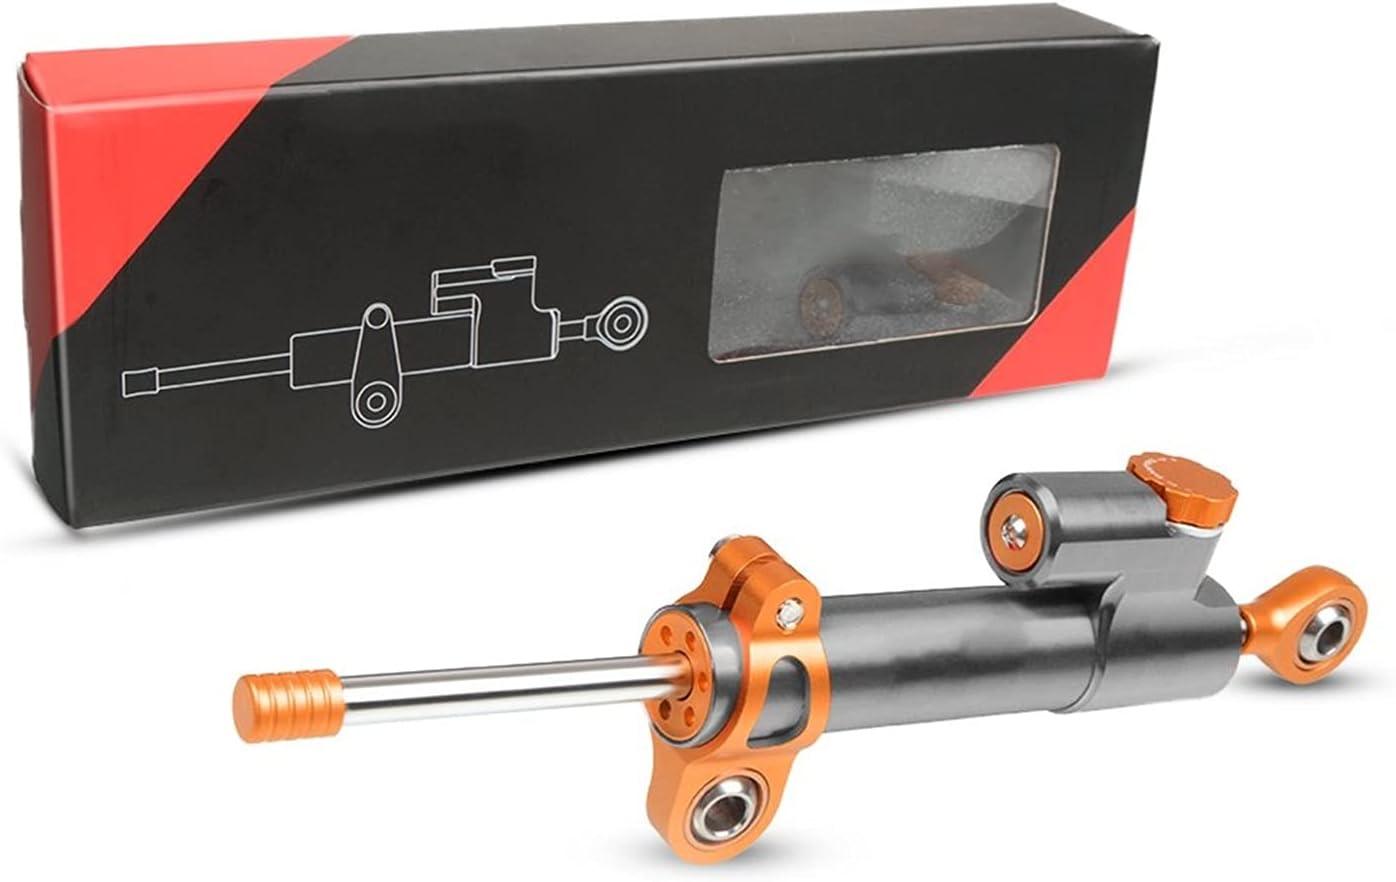 MOTOT Motorcycle Steering Damper A-prilia Houston Mall Fresno Mall Dorsod Stabilizer for